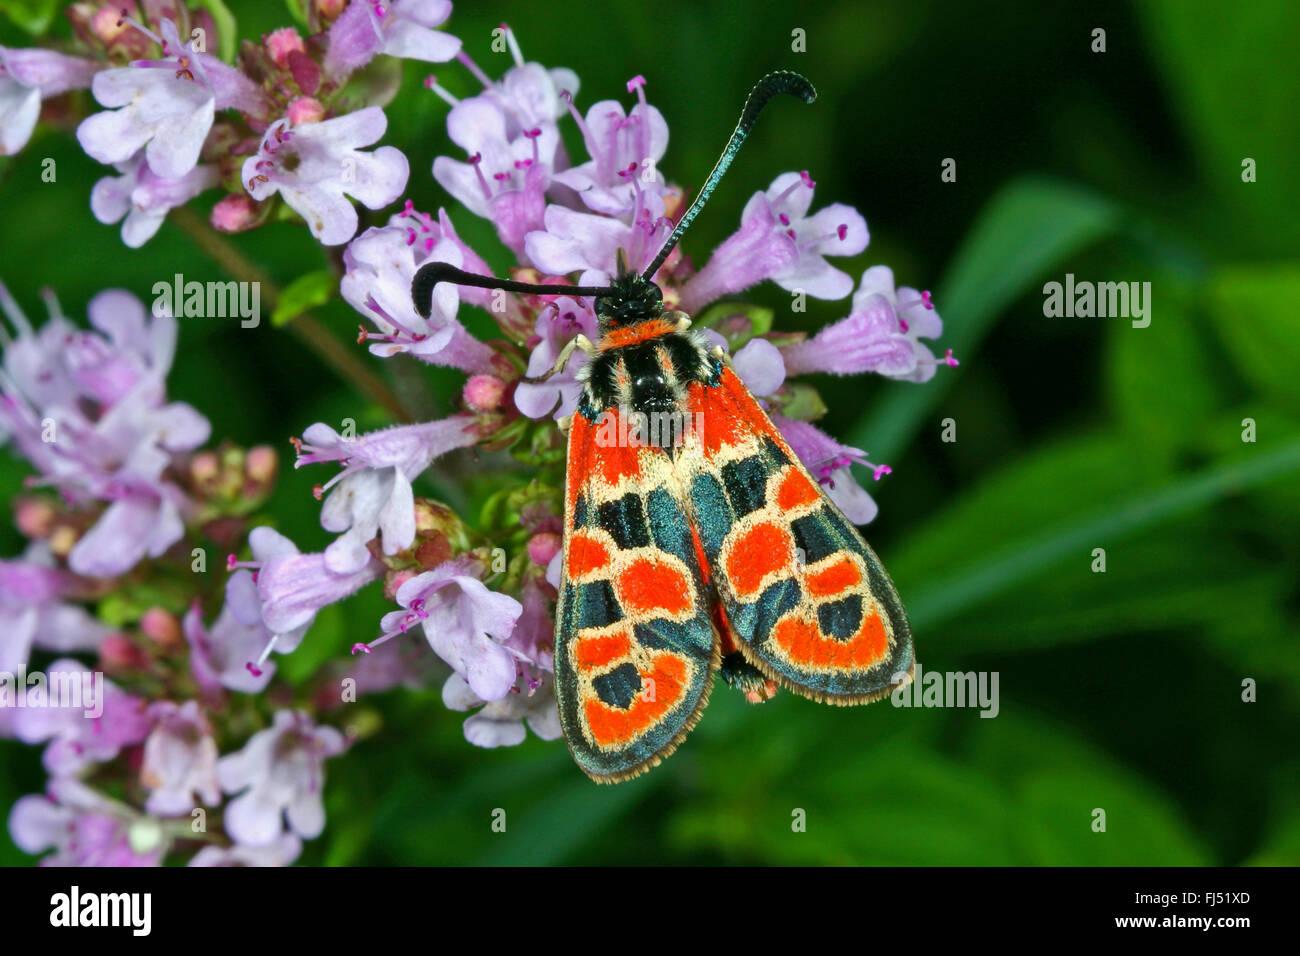 Auspicious Burnet Moth (Zygaena fausta, Zygaena faustina), on Origanum, Germany - Stock Image